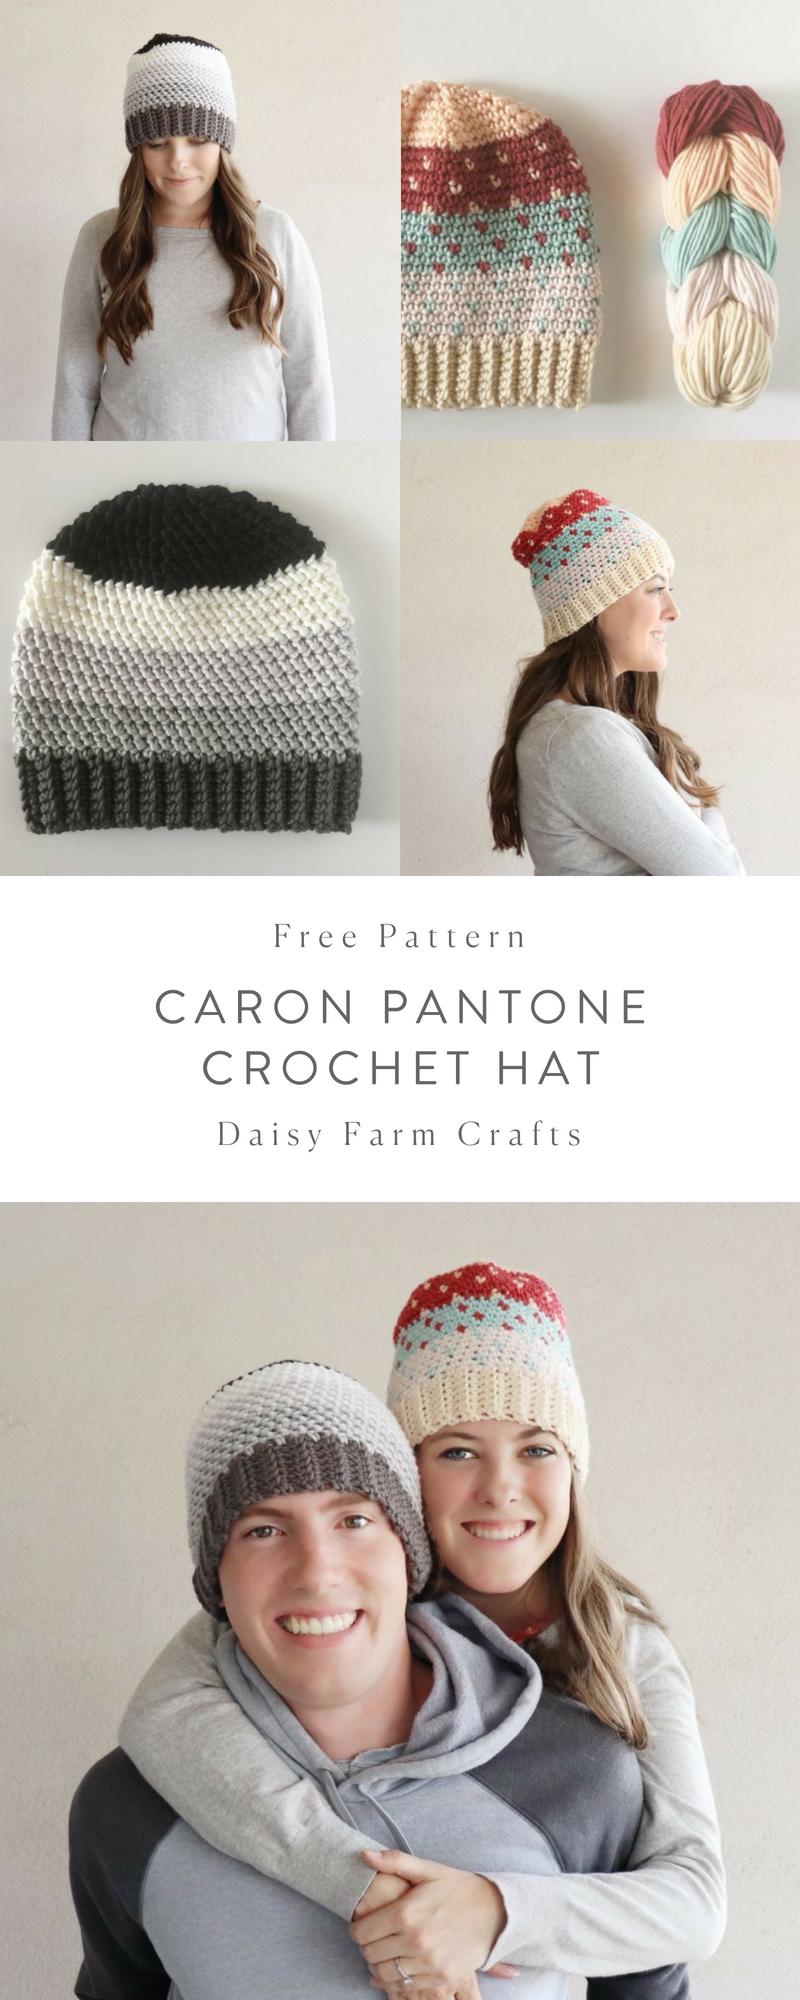 Free Pattern - Caron Pantone Crochet Hat | varios crochet ...